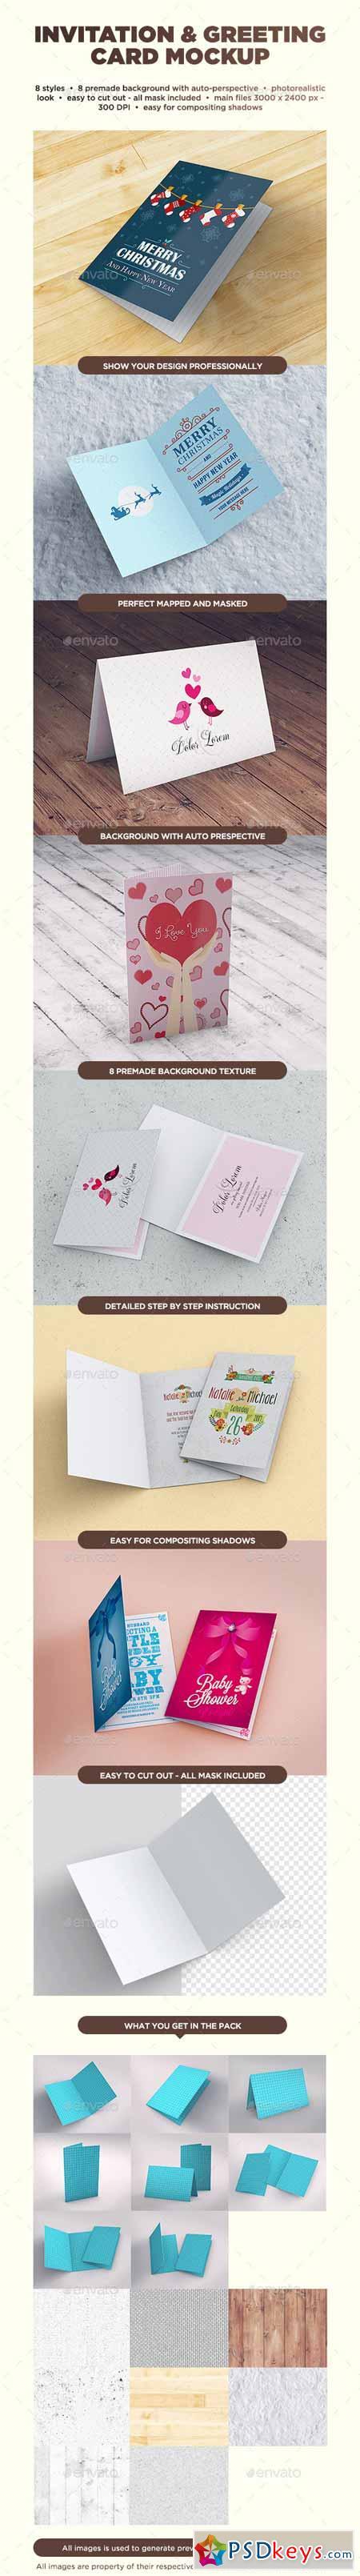 Invitation Greeting Card Mockup 10566468 Free Download